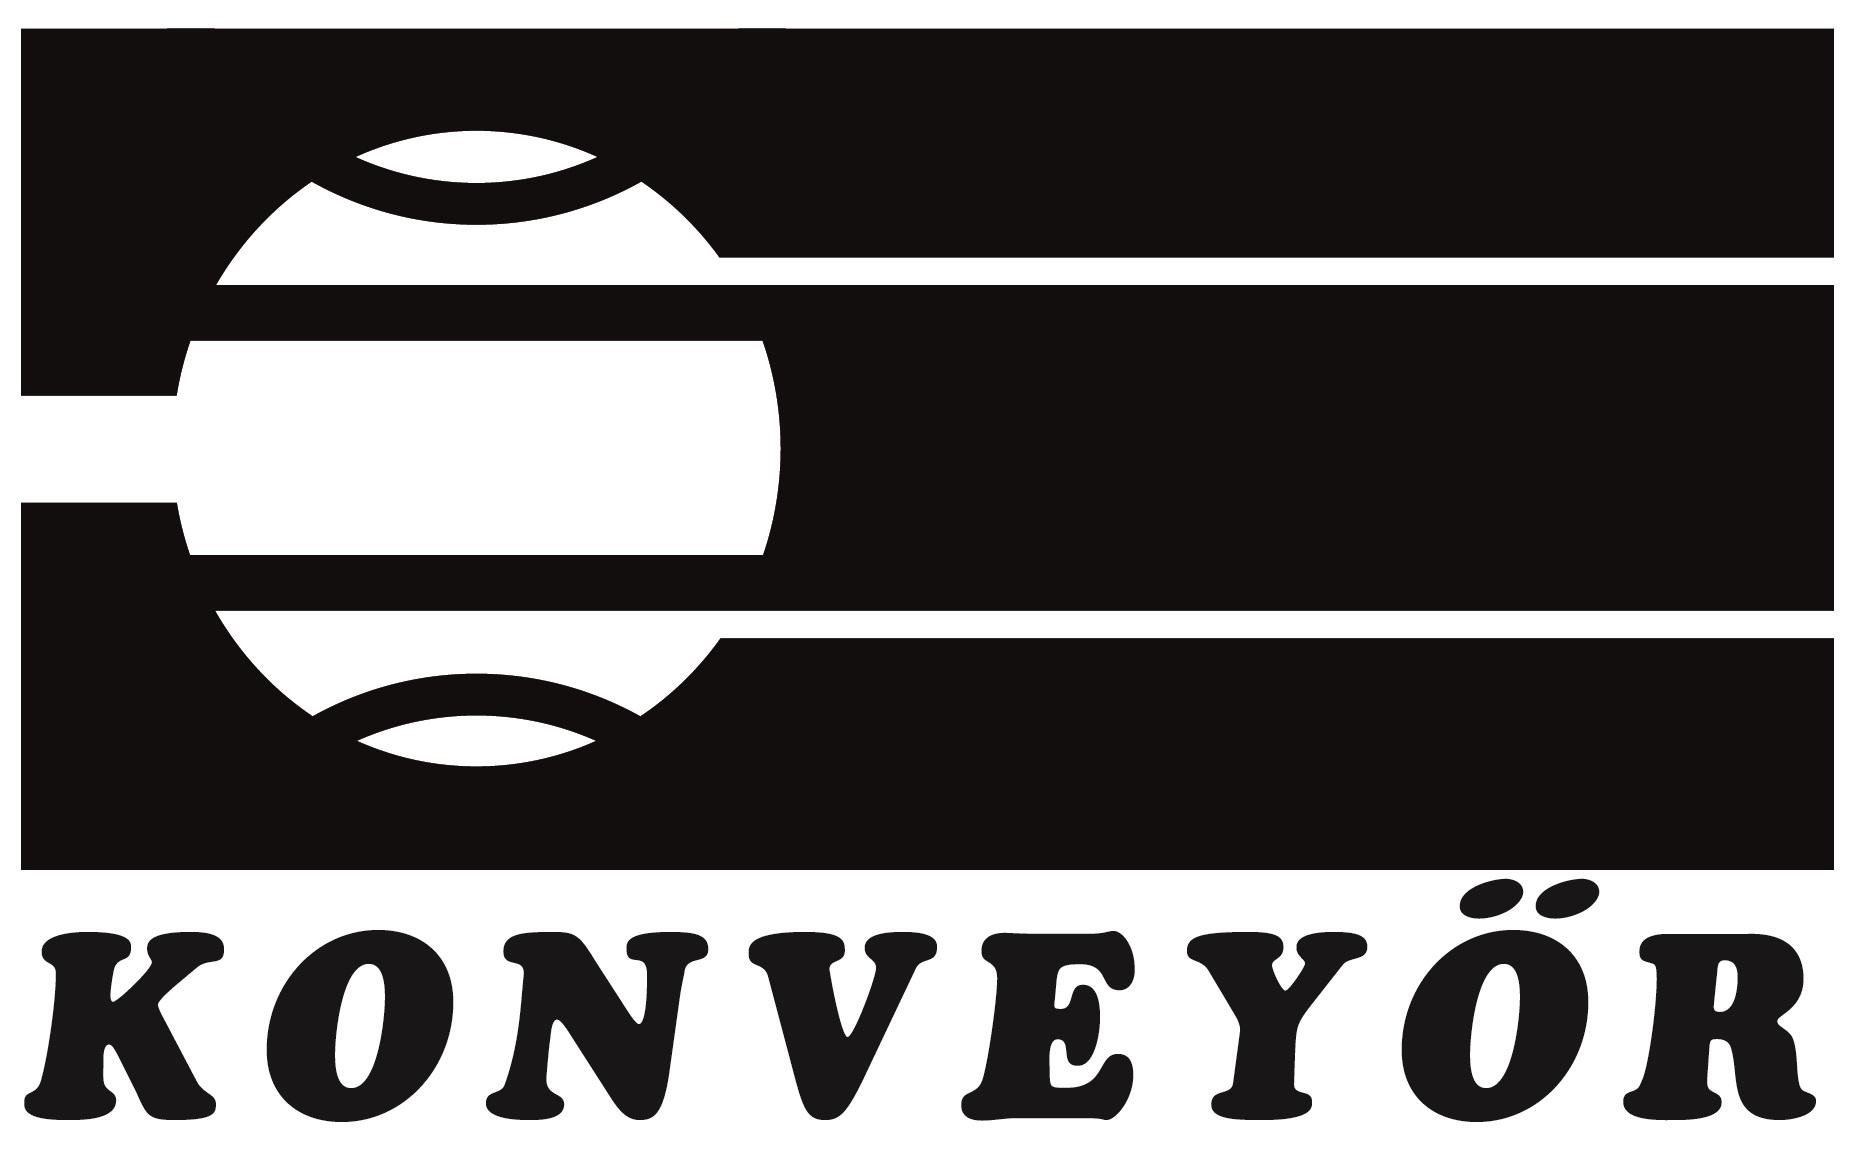 Konveyör Beyaz Eşya ve Otomotiv Yan Sanayi Tic. A.Ş